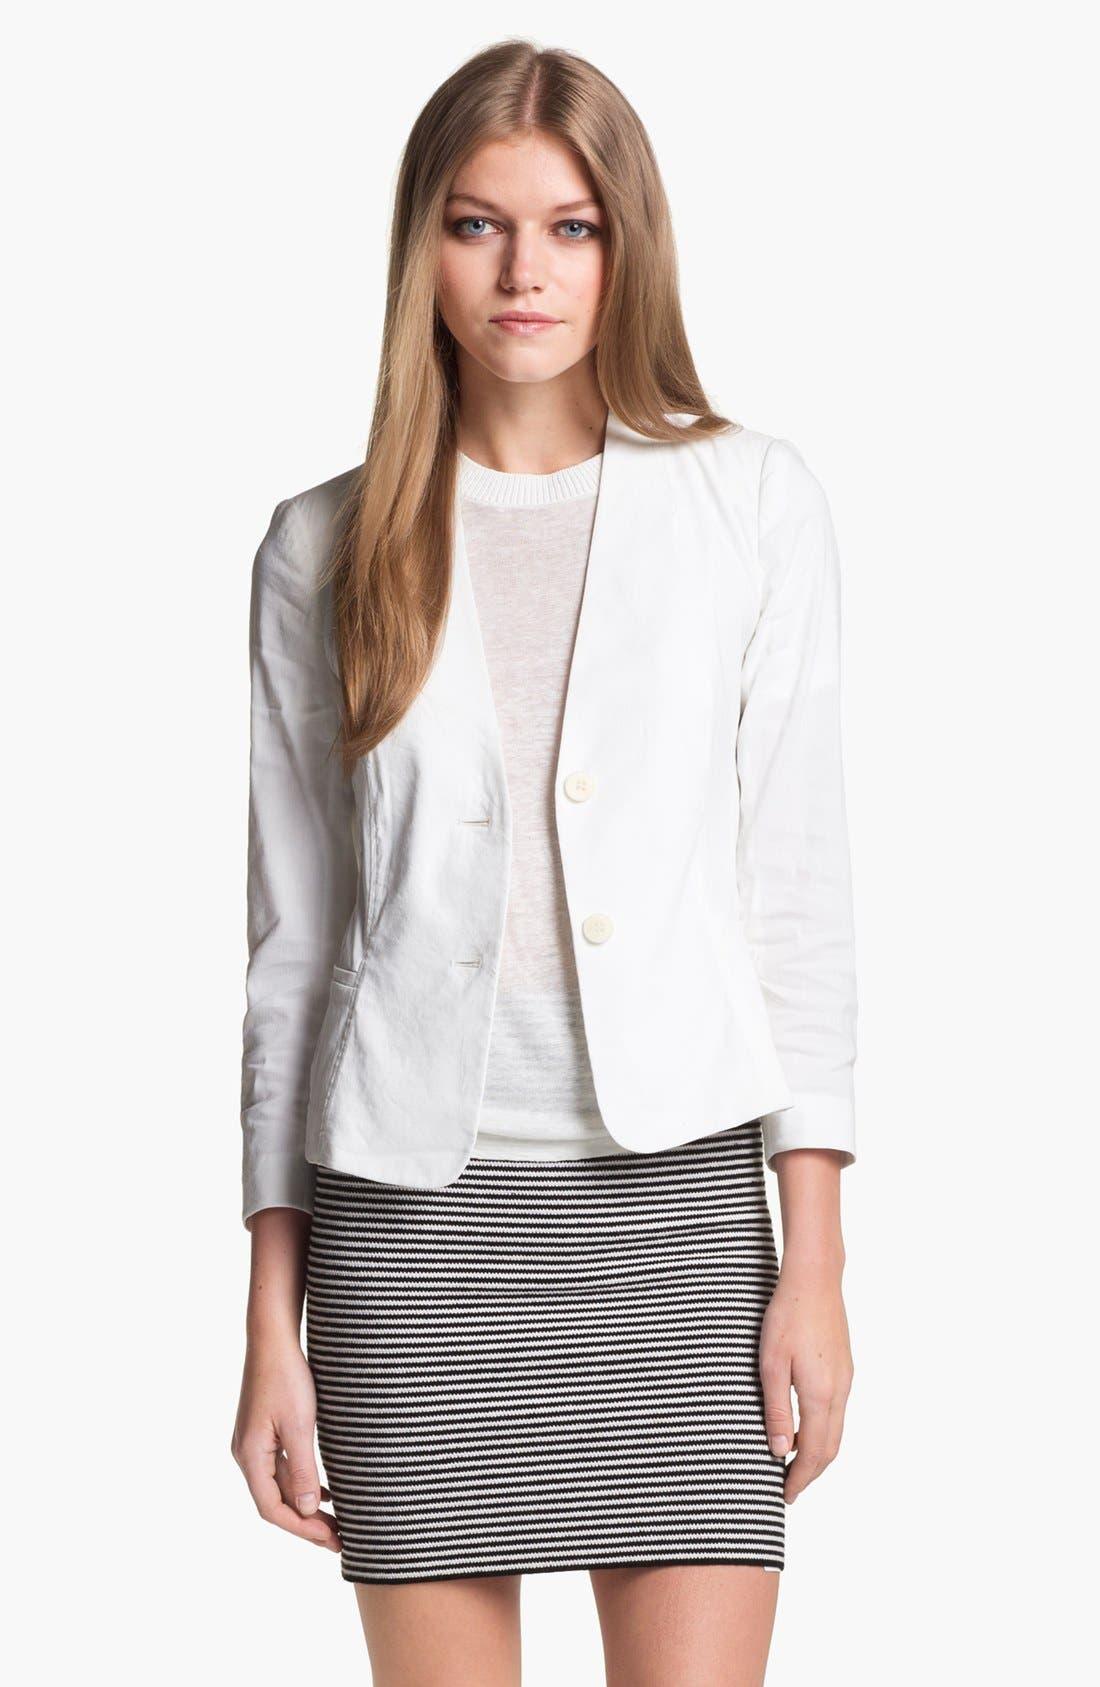 Alternate Image 1 Selected - Theory 'Dalite' Linen Blend Jacket